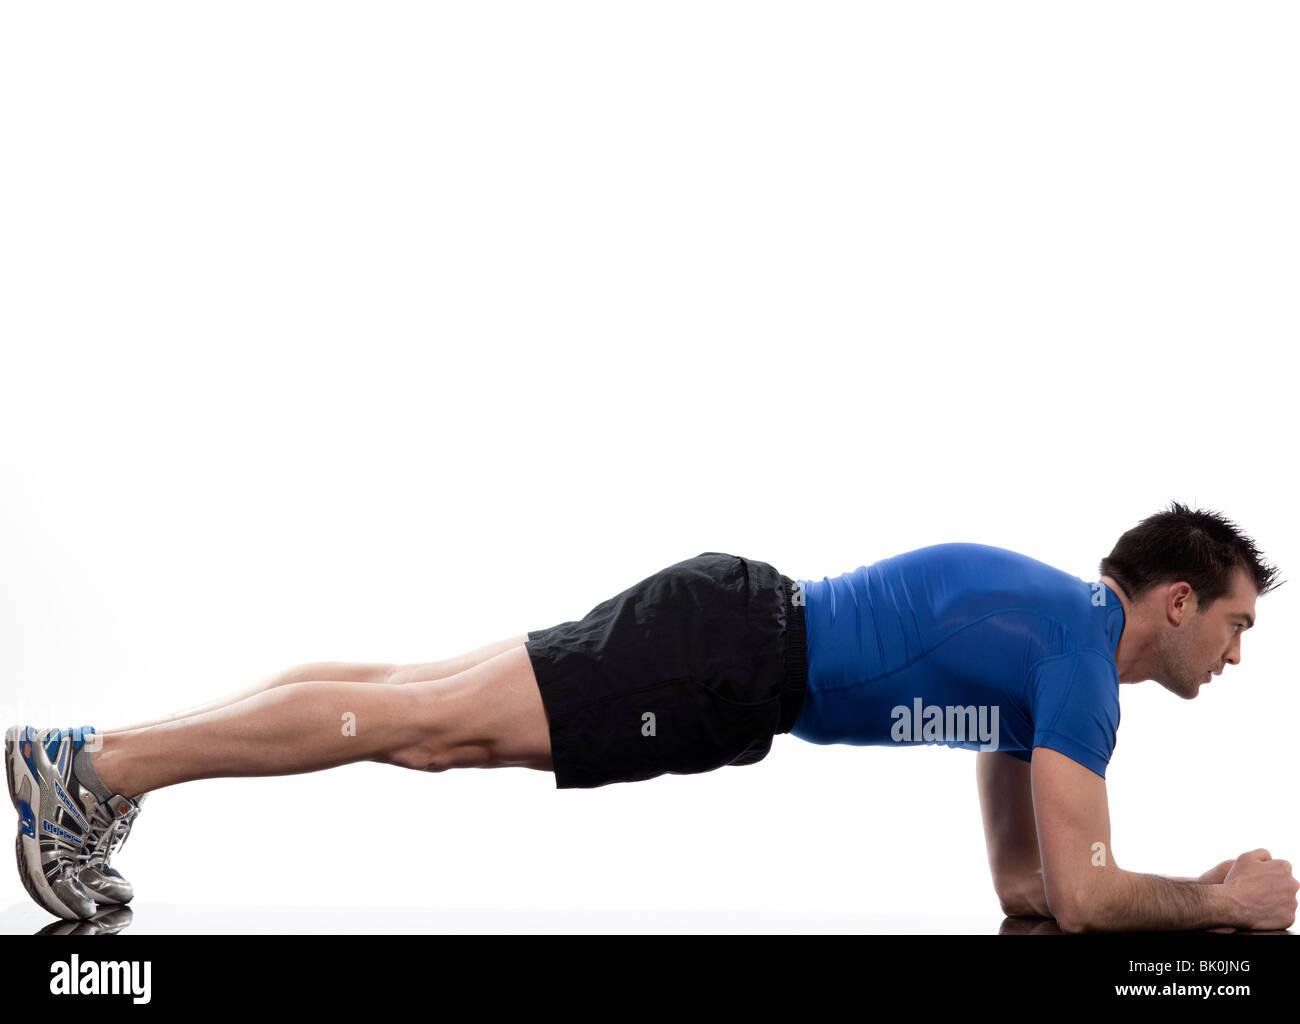 man on Abdominals workout Basic Plank posture on white background - Stock Image